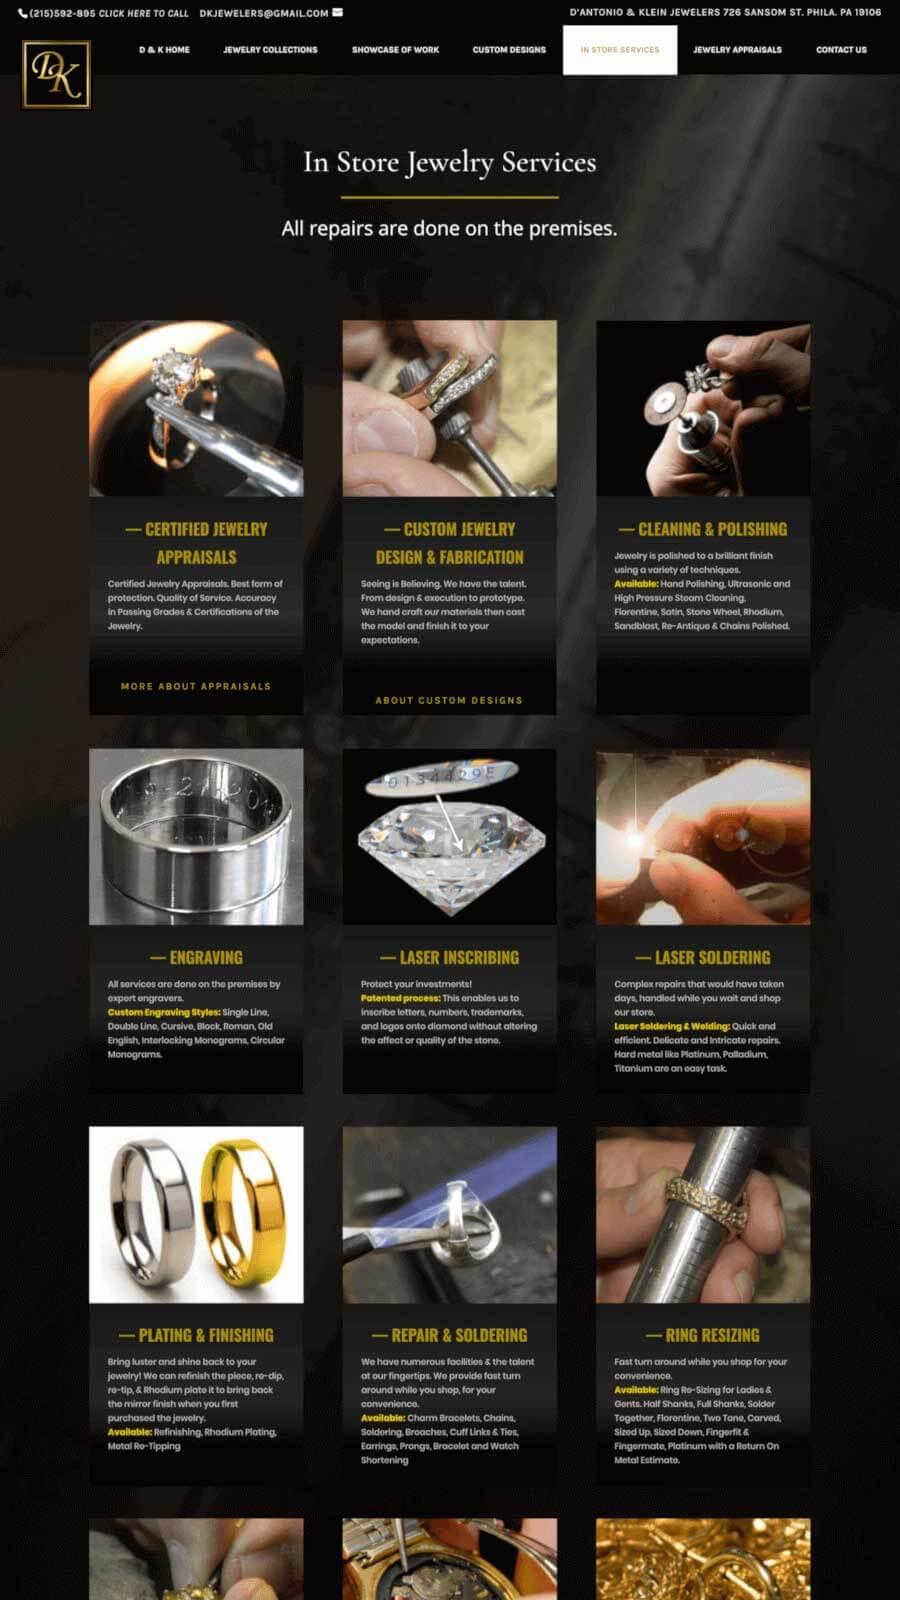 D'Antonio & Klein Services Page